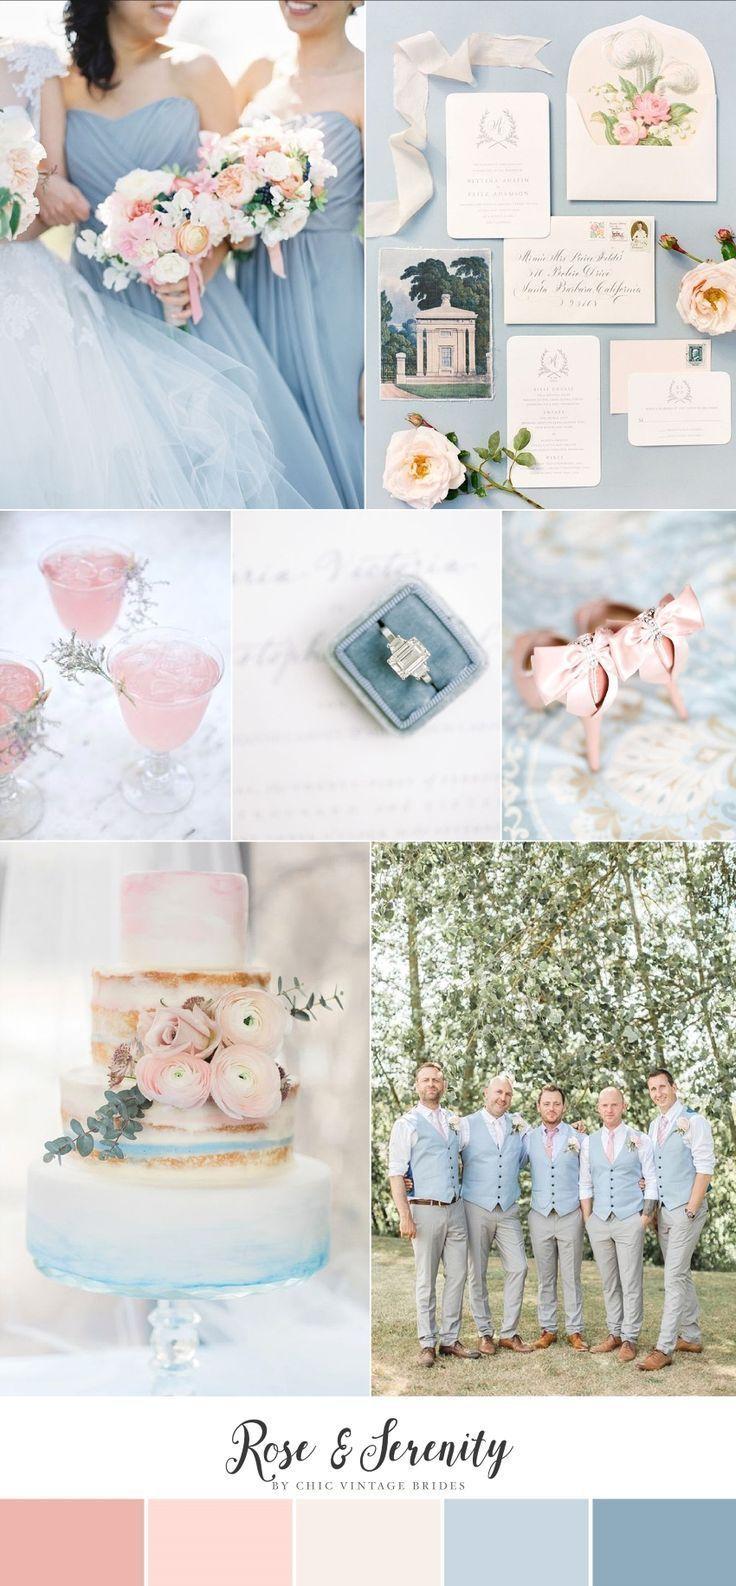 Rose u serenity romantic wedding inspiration in pantoneus colours